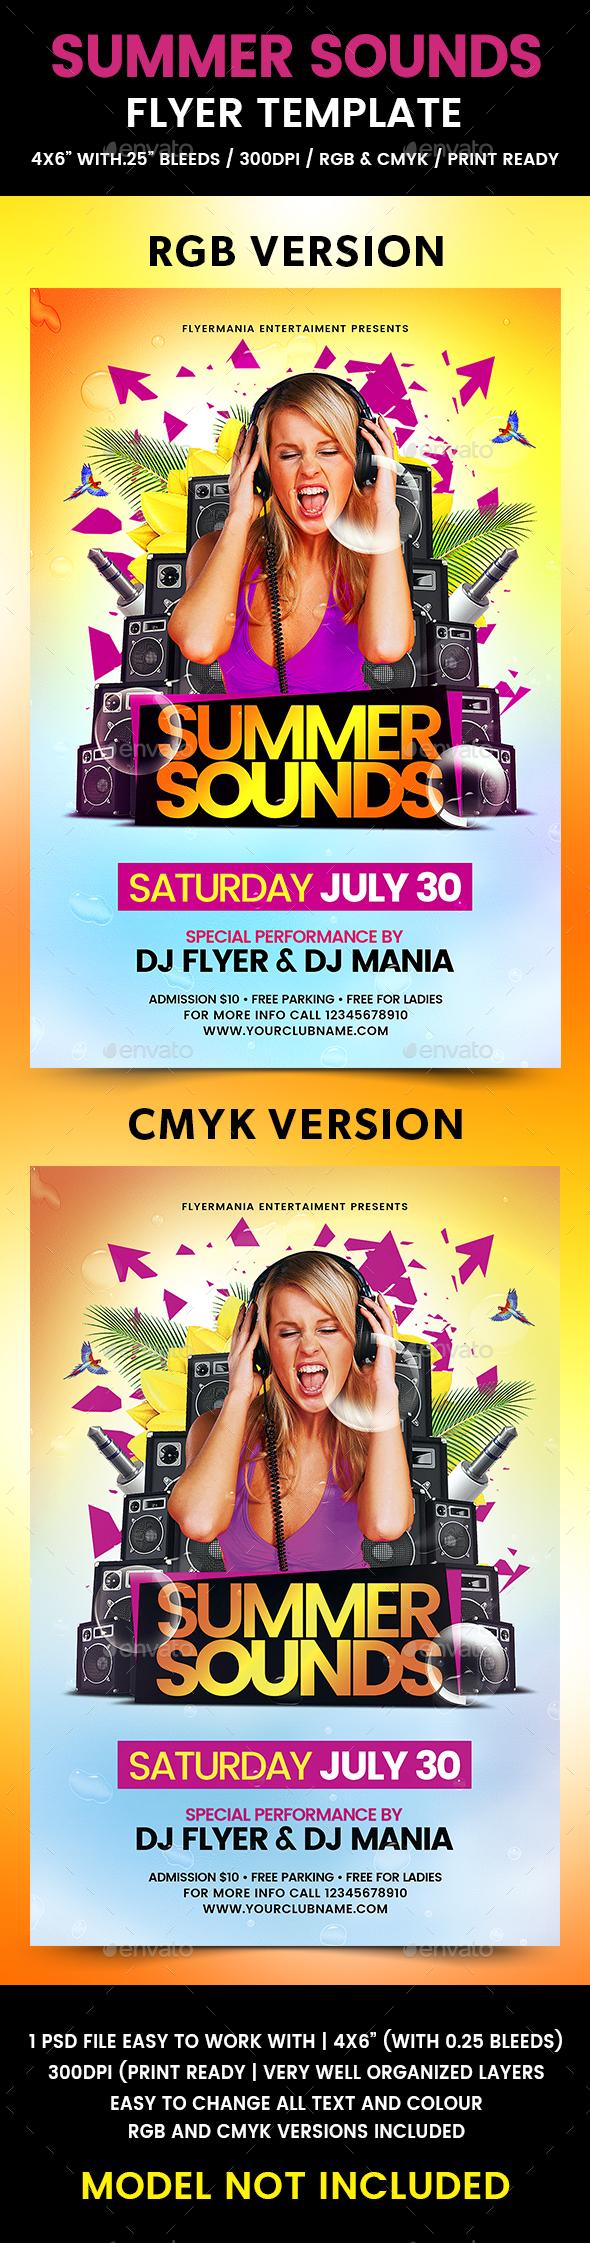 Summer Sounds Flyer Template - Flyers Print Templates